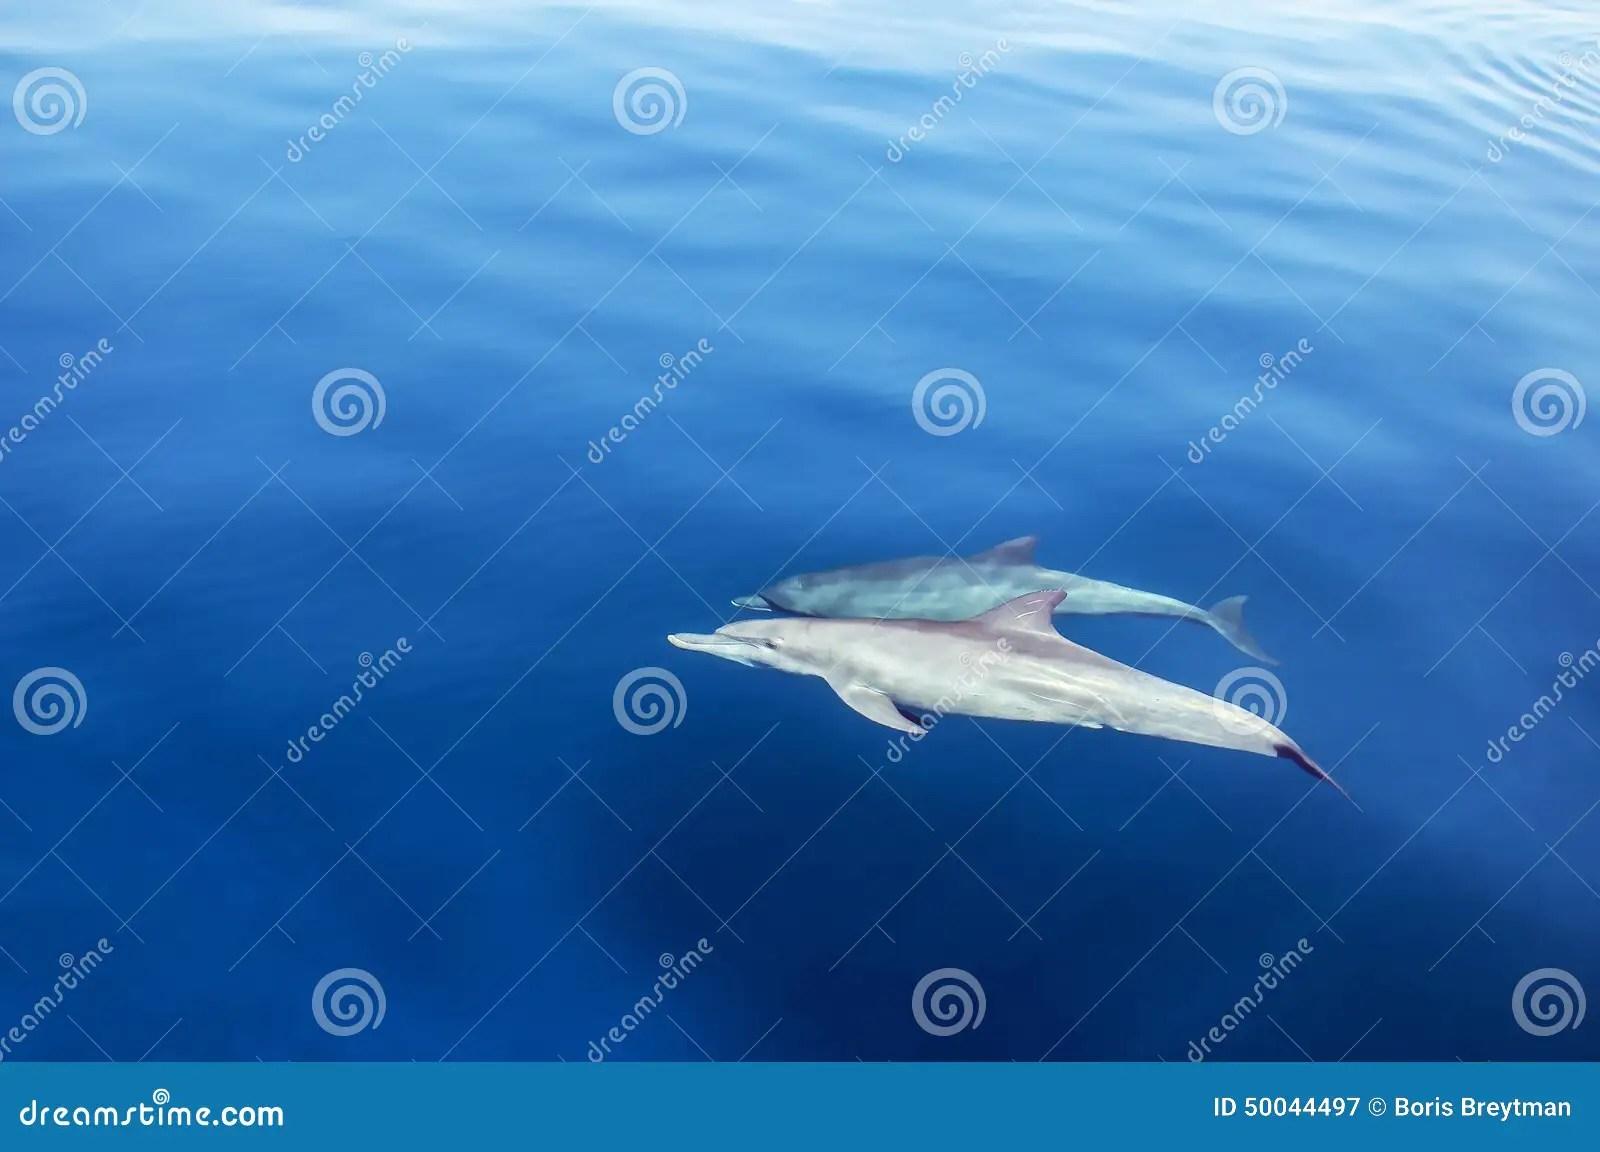 Dolphin In Ocean